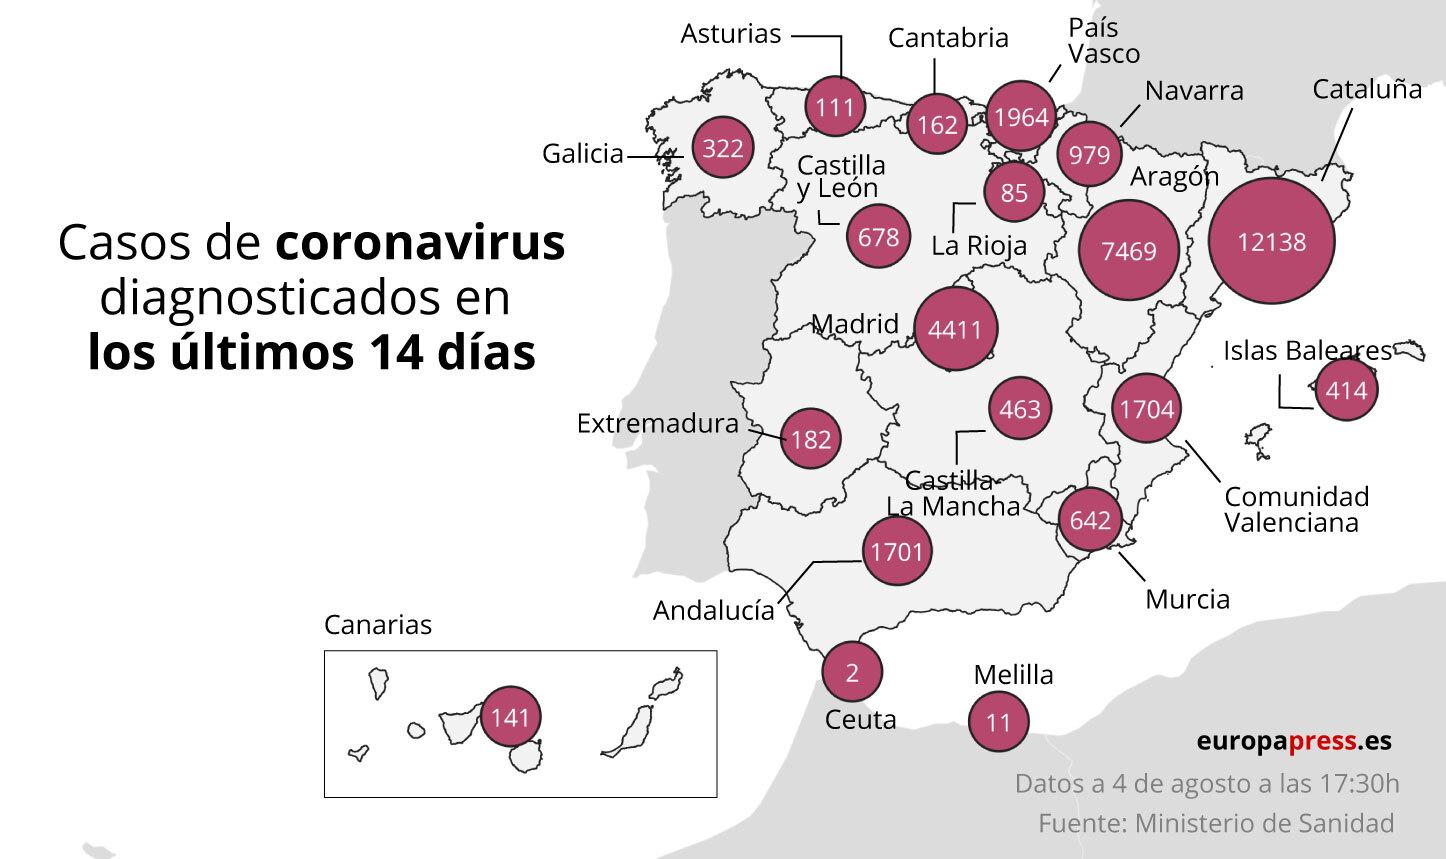 El coronavirus en España a 4 de agosto